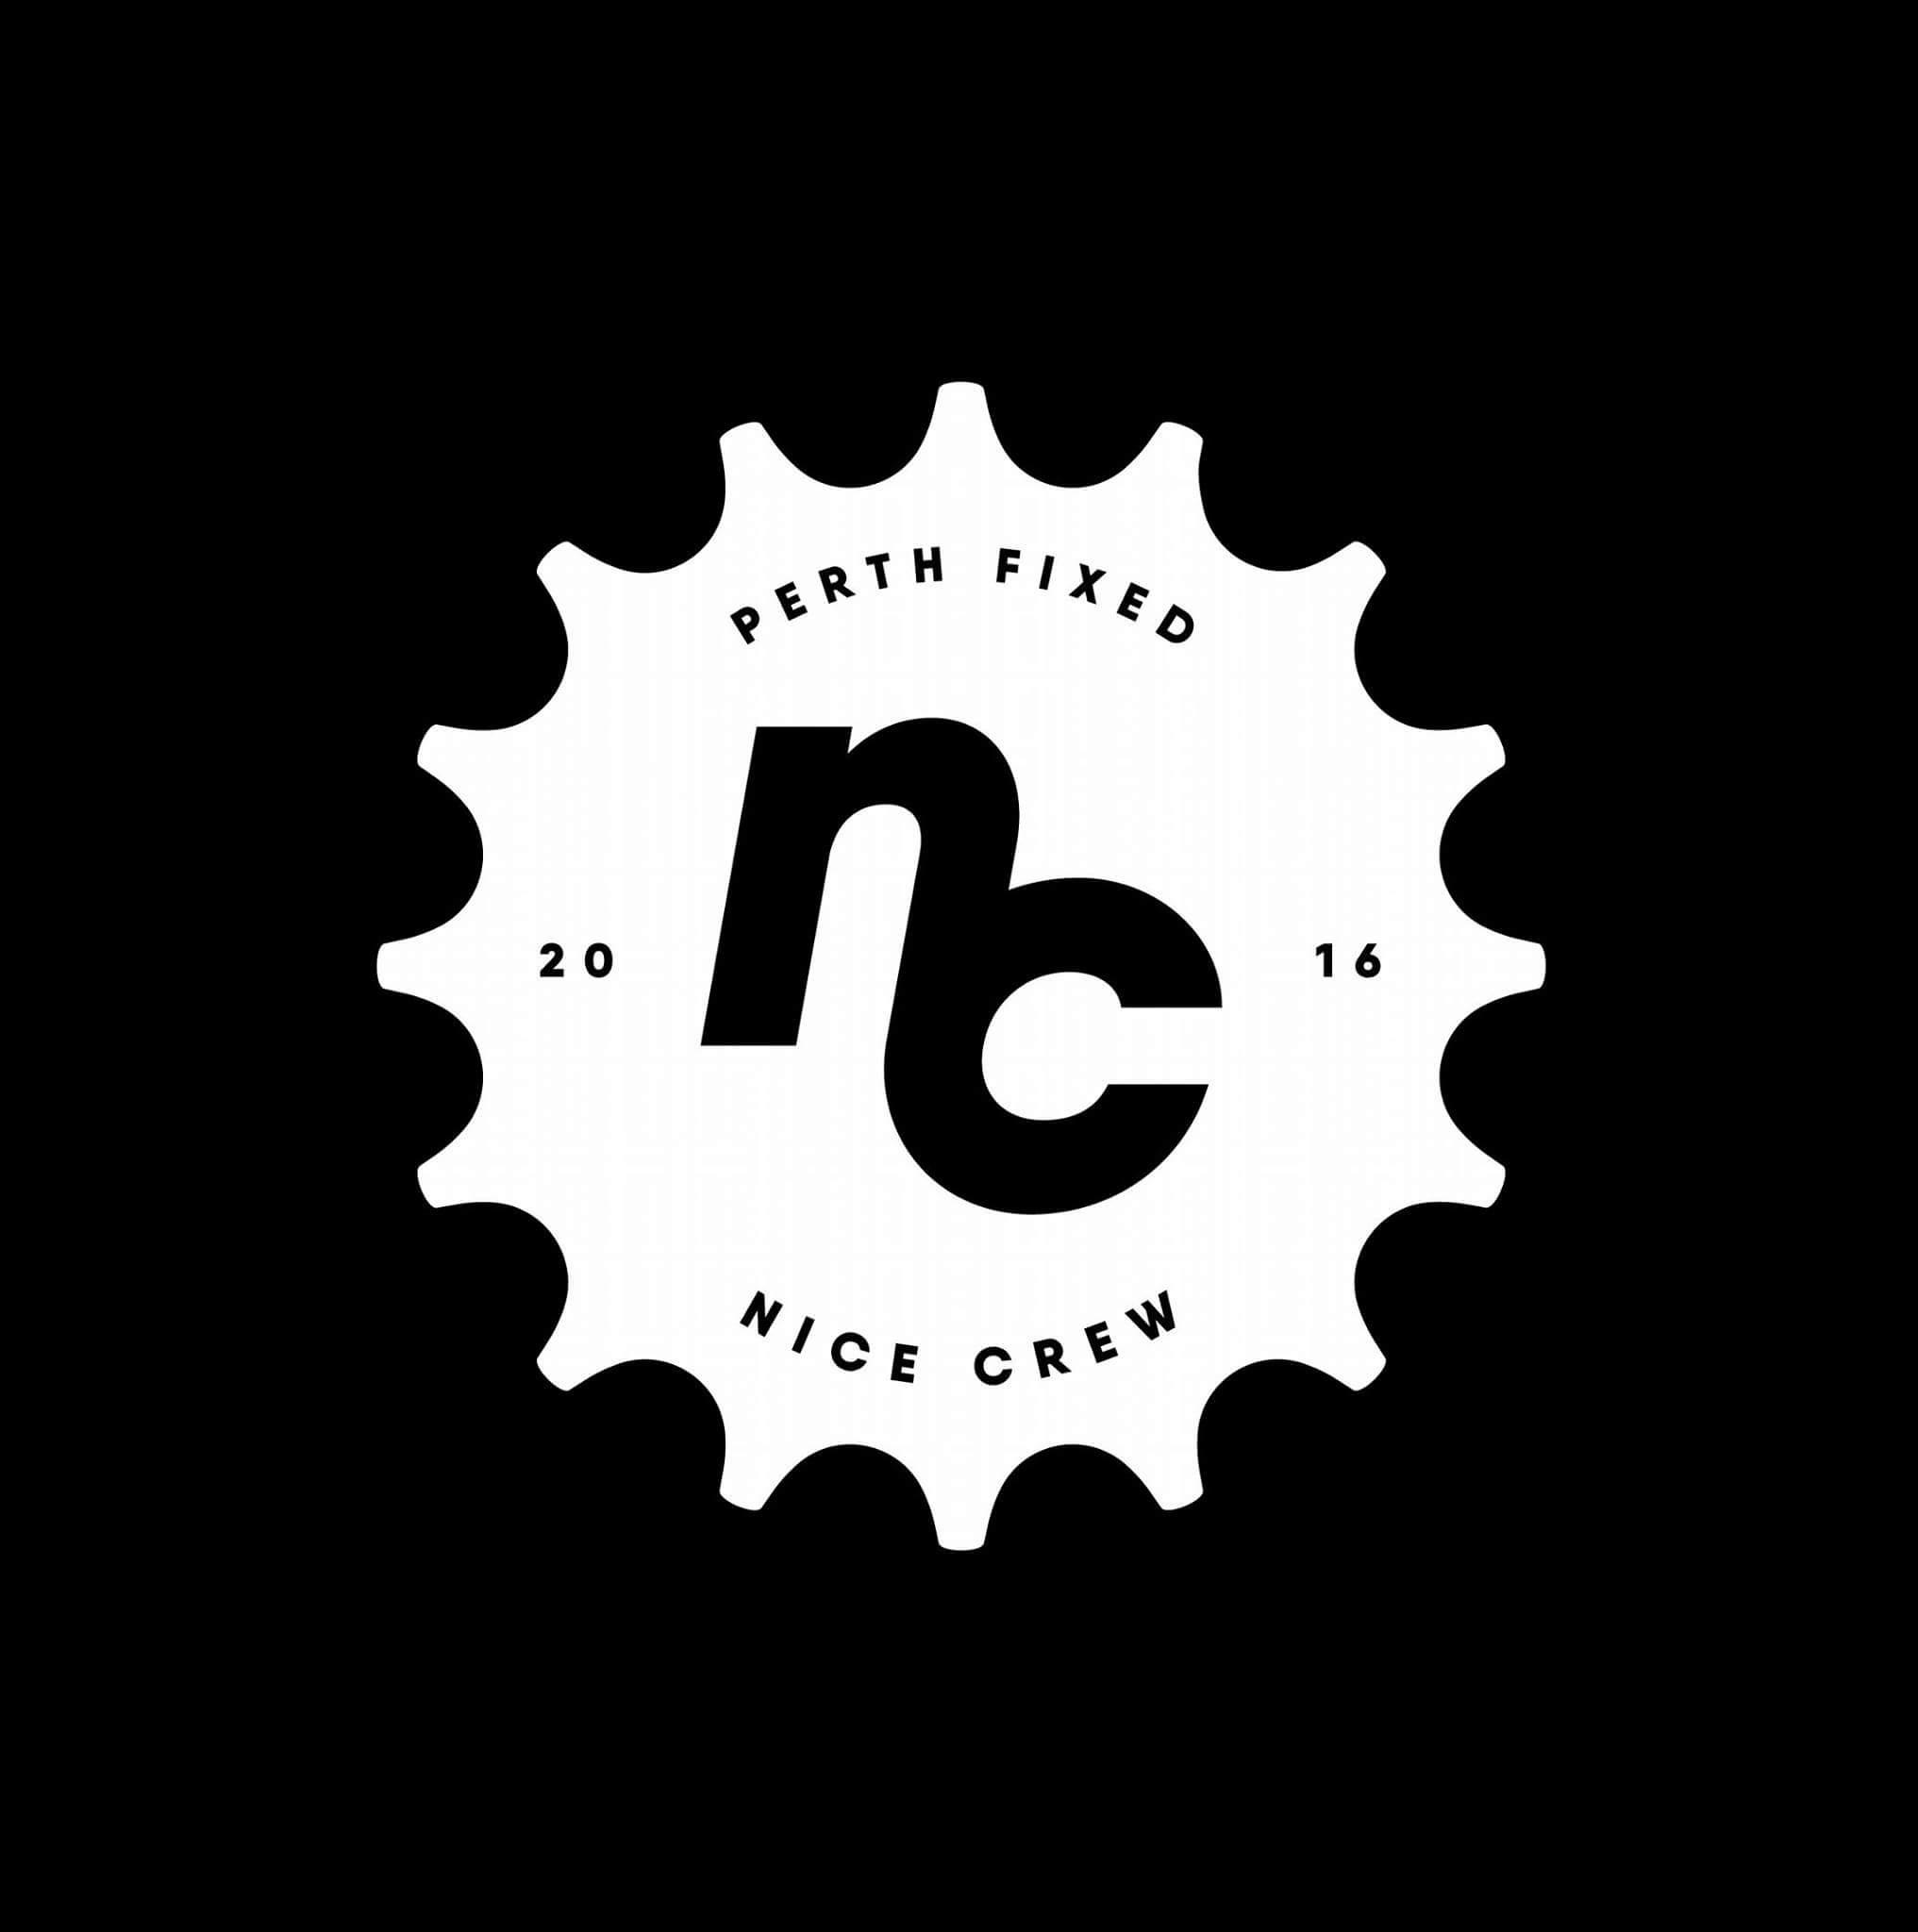 Nice Crew logo